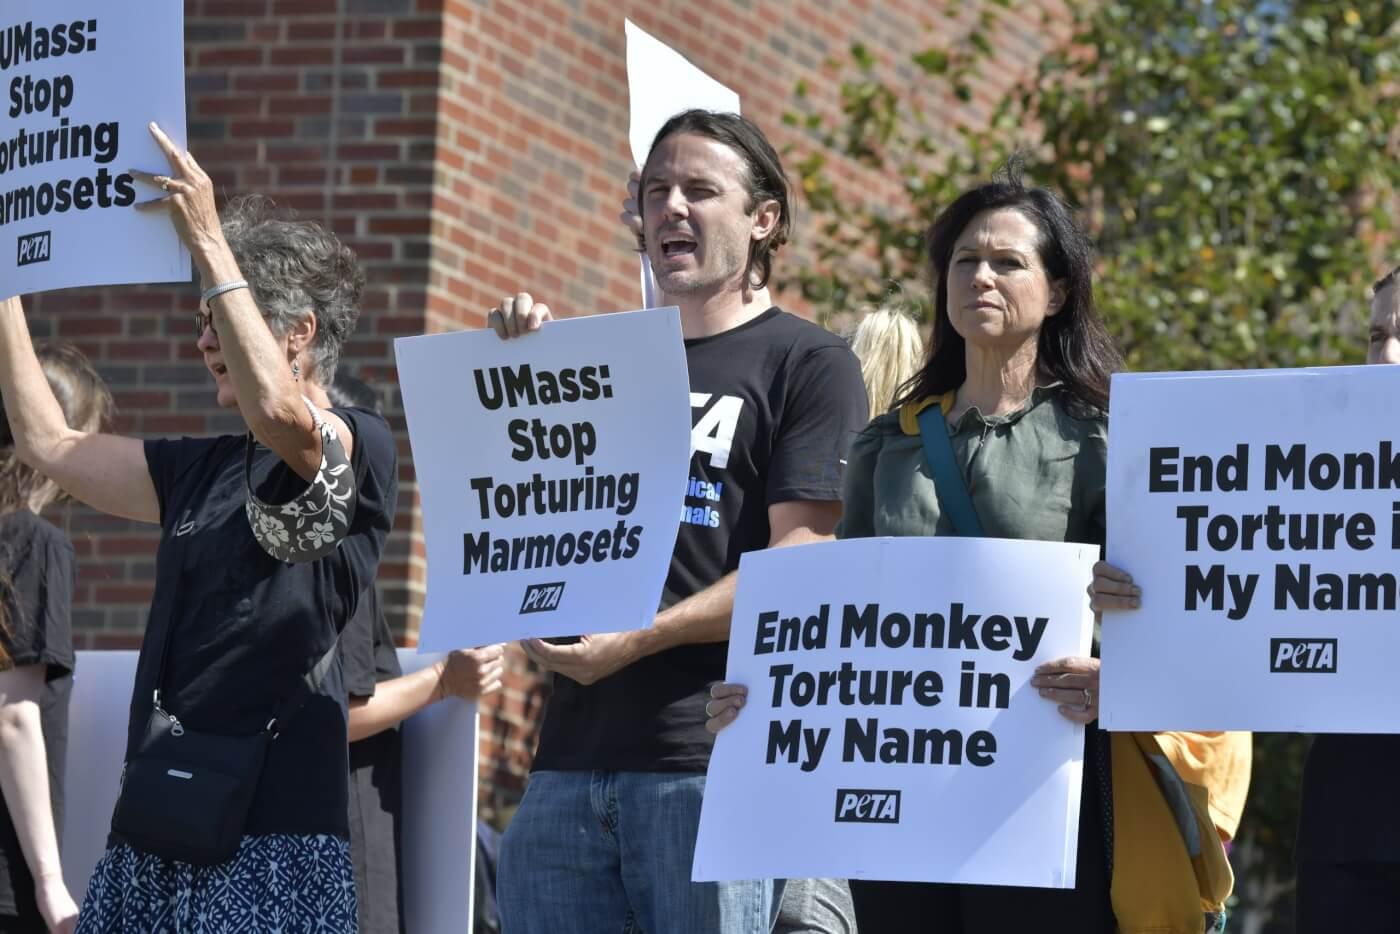 Lisa Lange Casey Affleck PETA protests monkey experiments UMass 2021